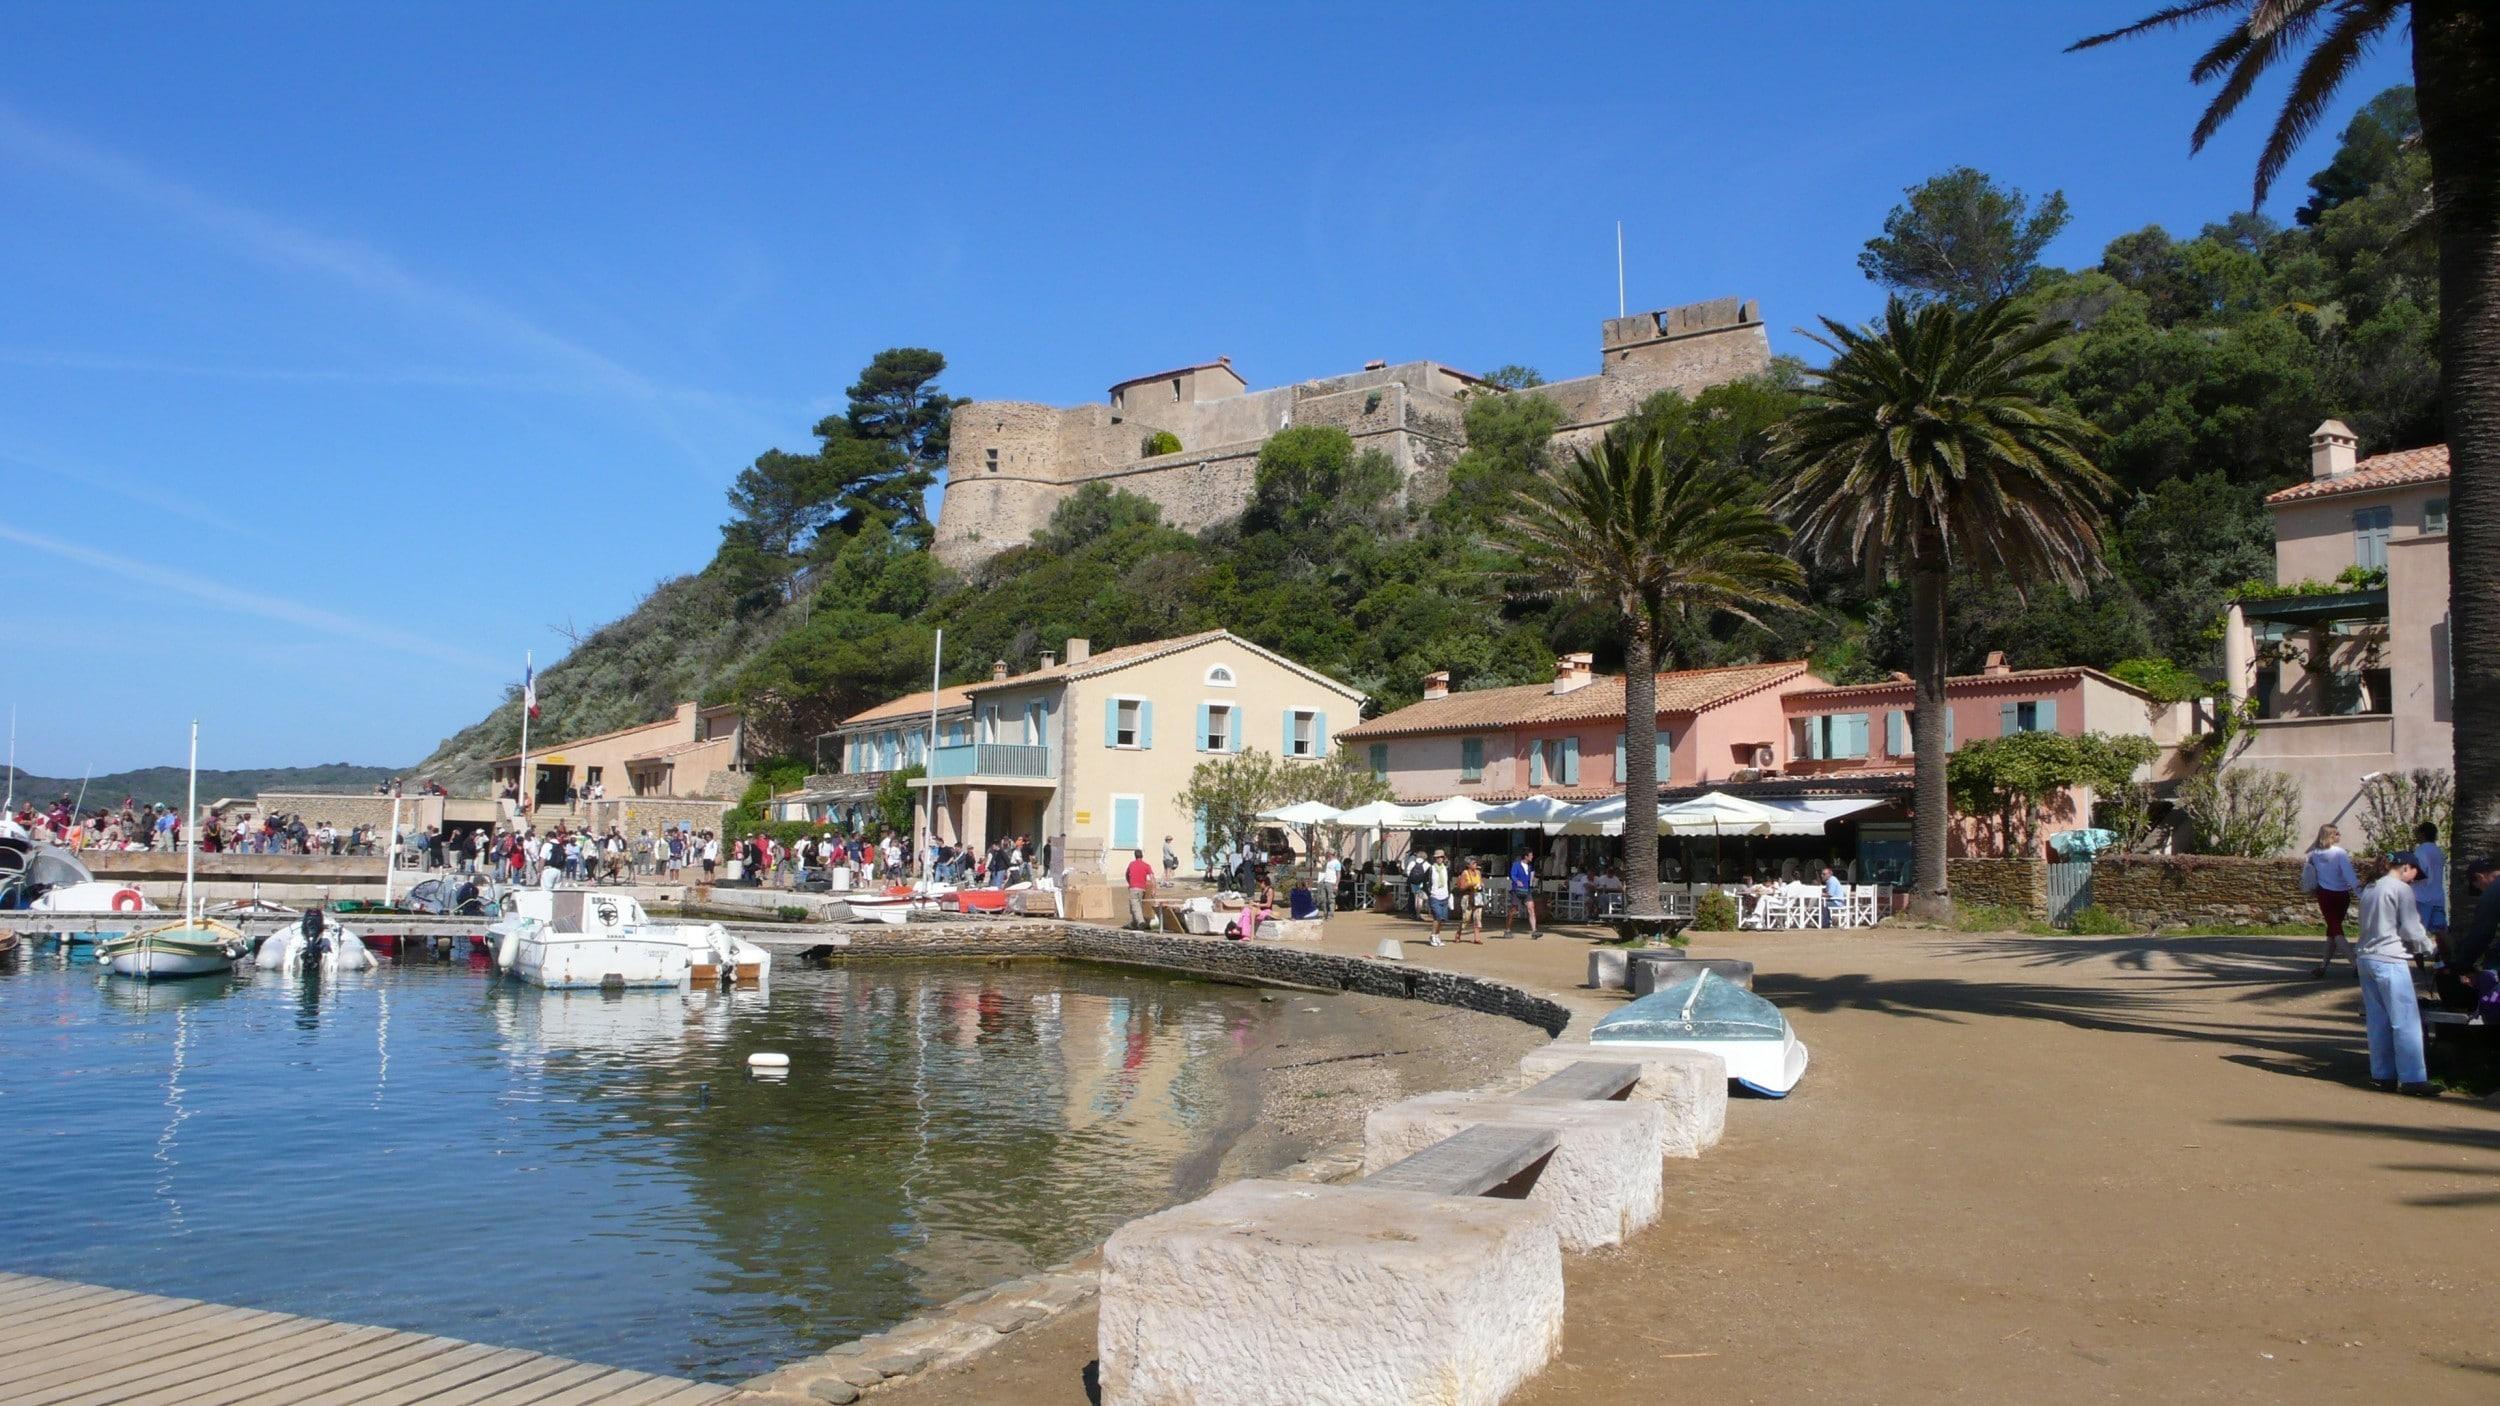 Croisiere cabine cote Azur - port cros